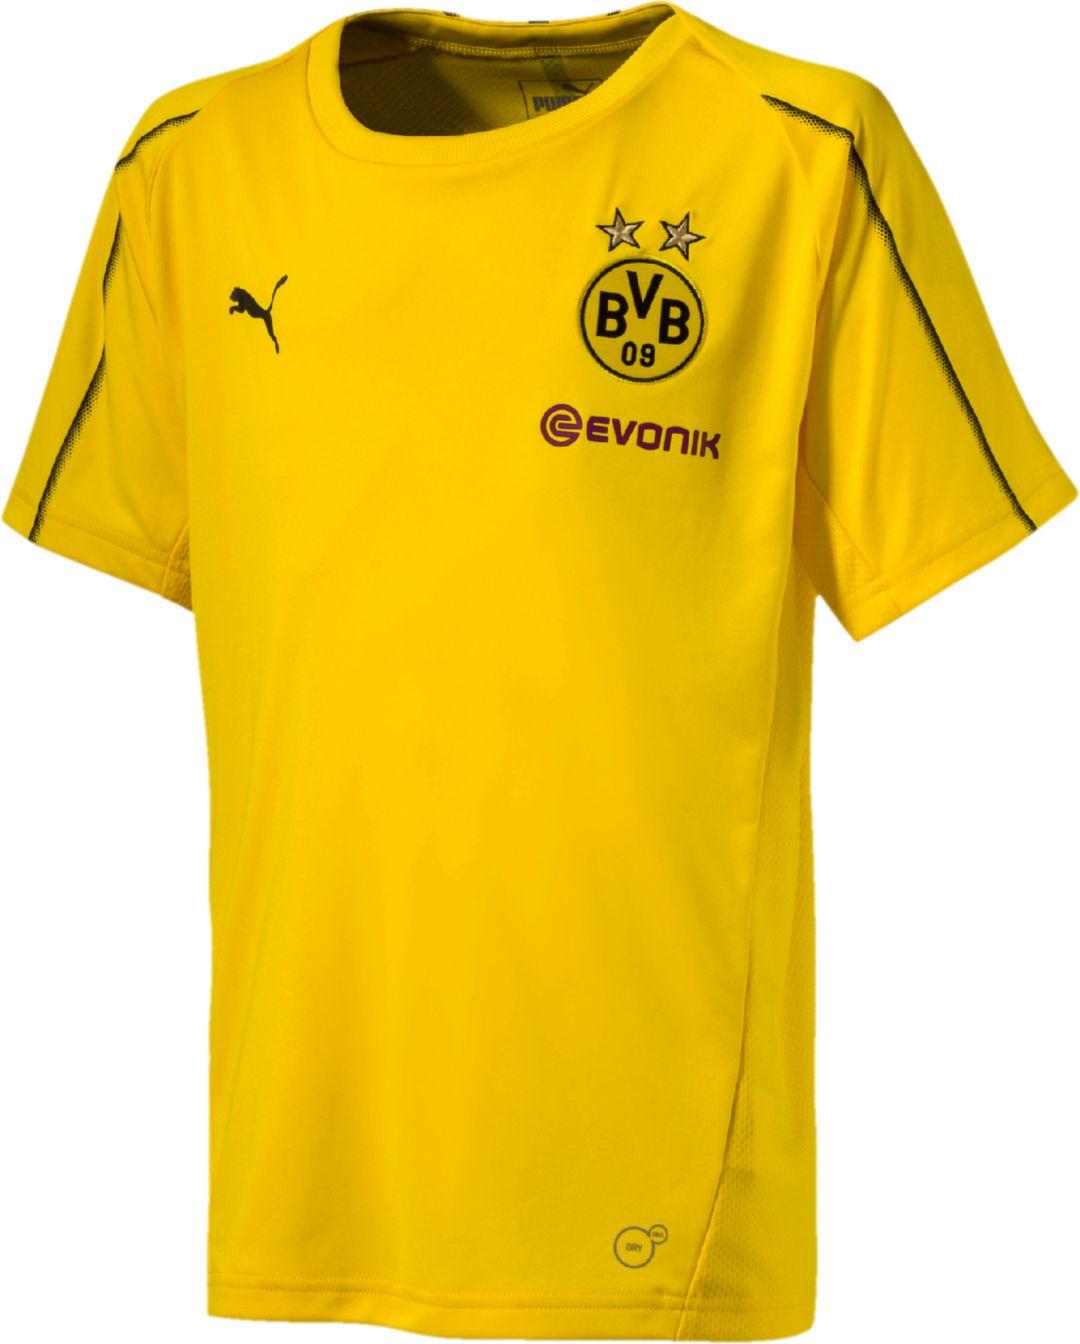 buy popular 2d3b0 83e26 PUMA Youth Borussia Dortmund Yellow Training Top